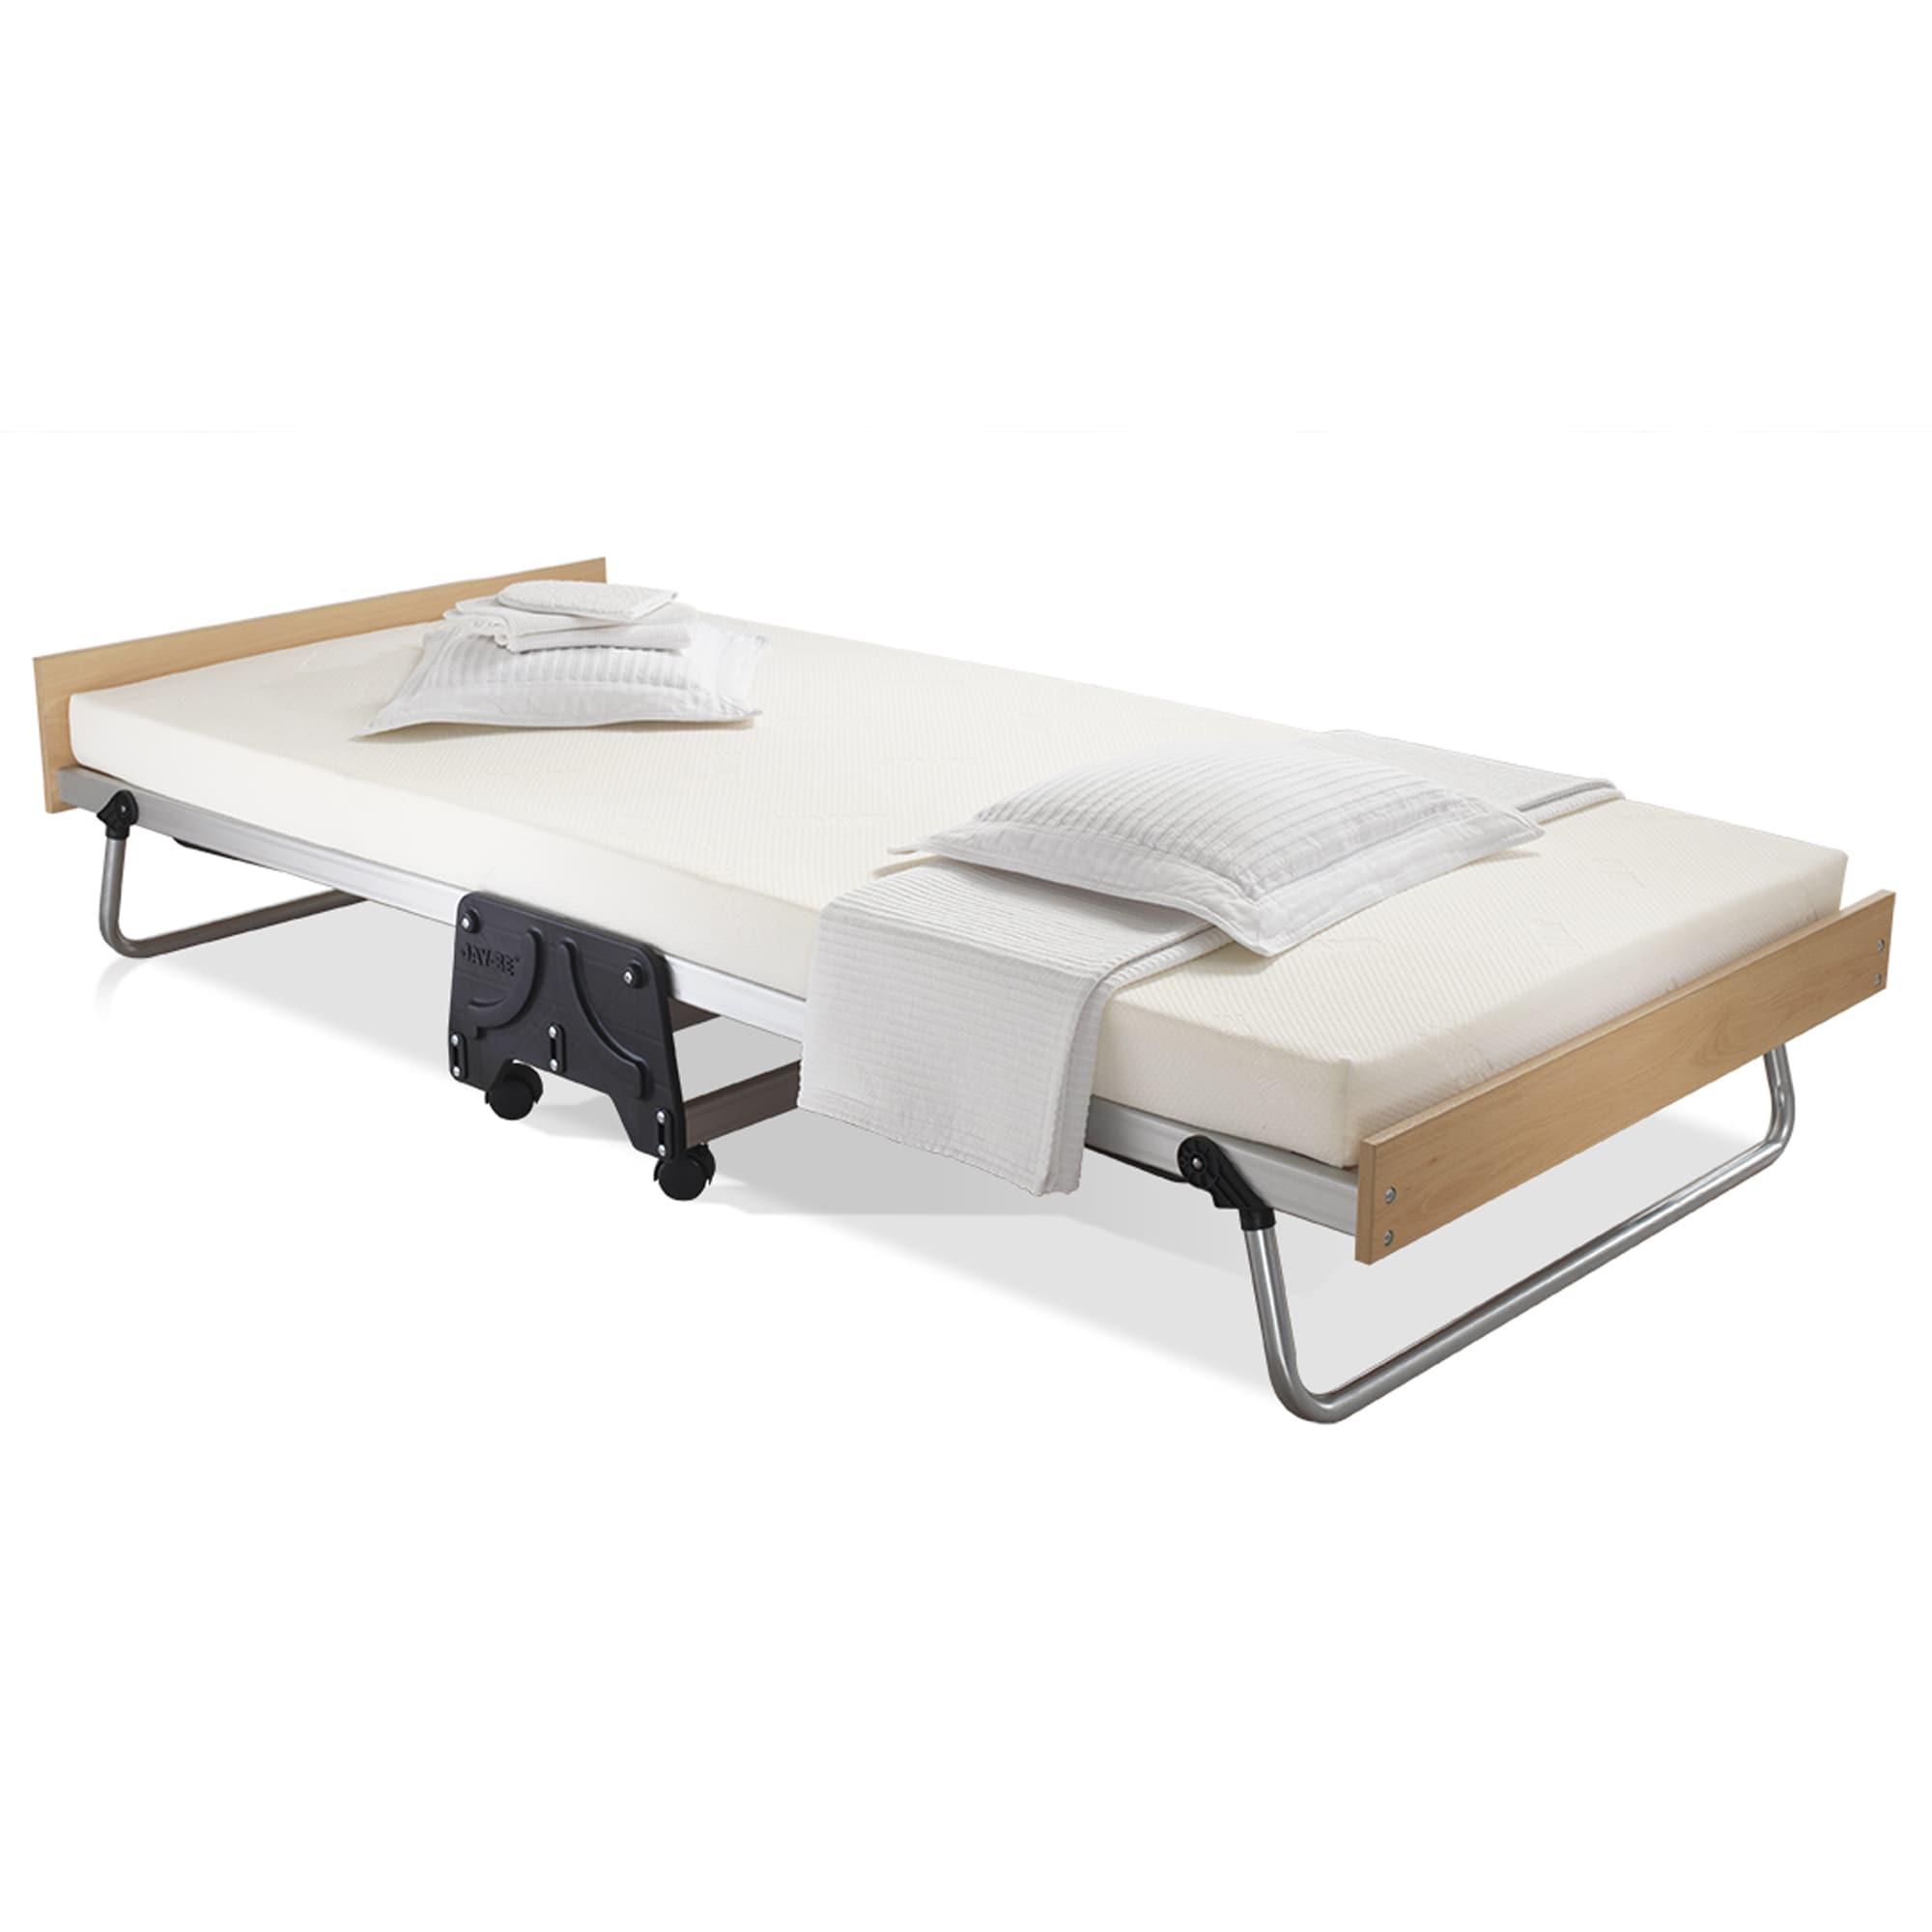 - Shop Jay-be J-bed Memory Foam Folding Bed - On Sale - Overstock